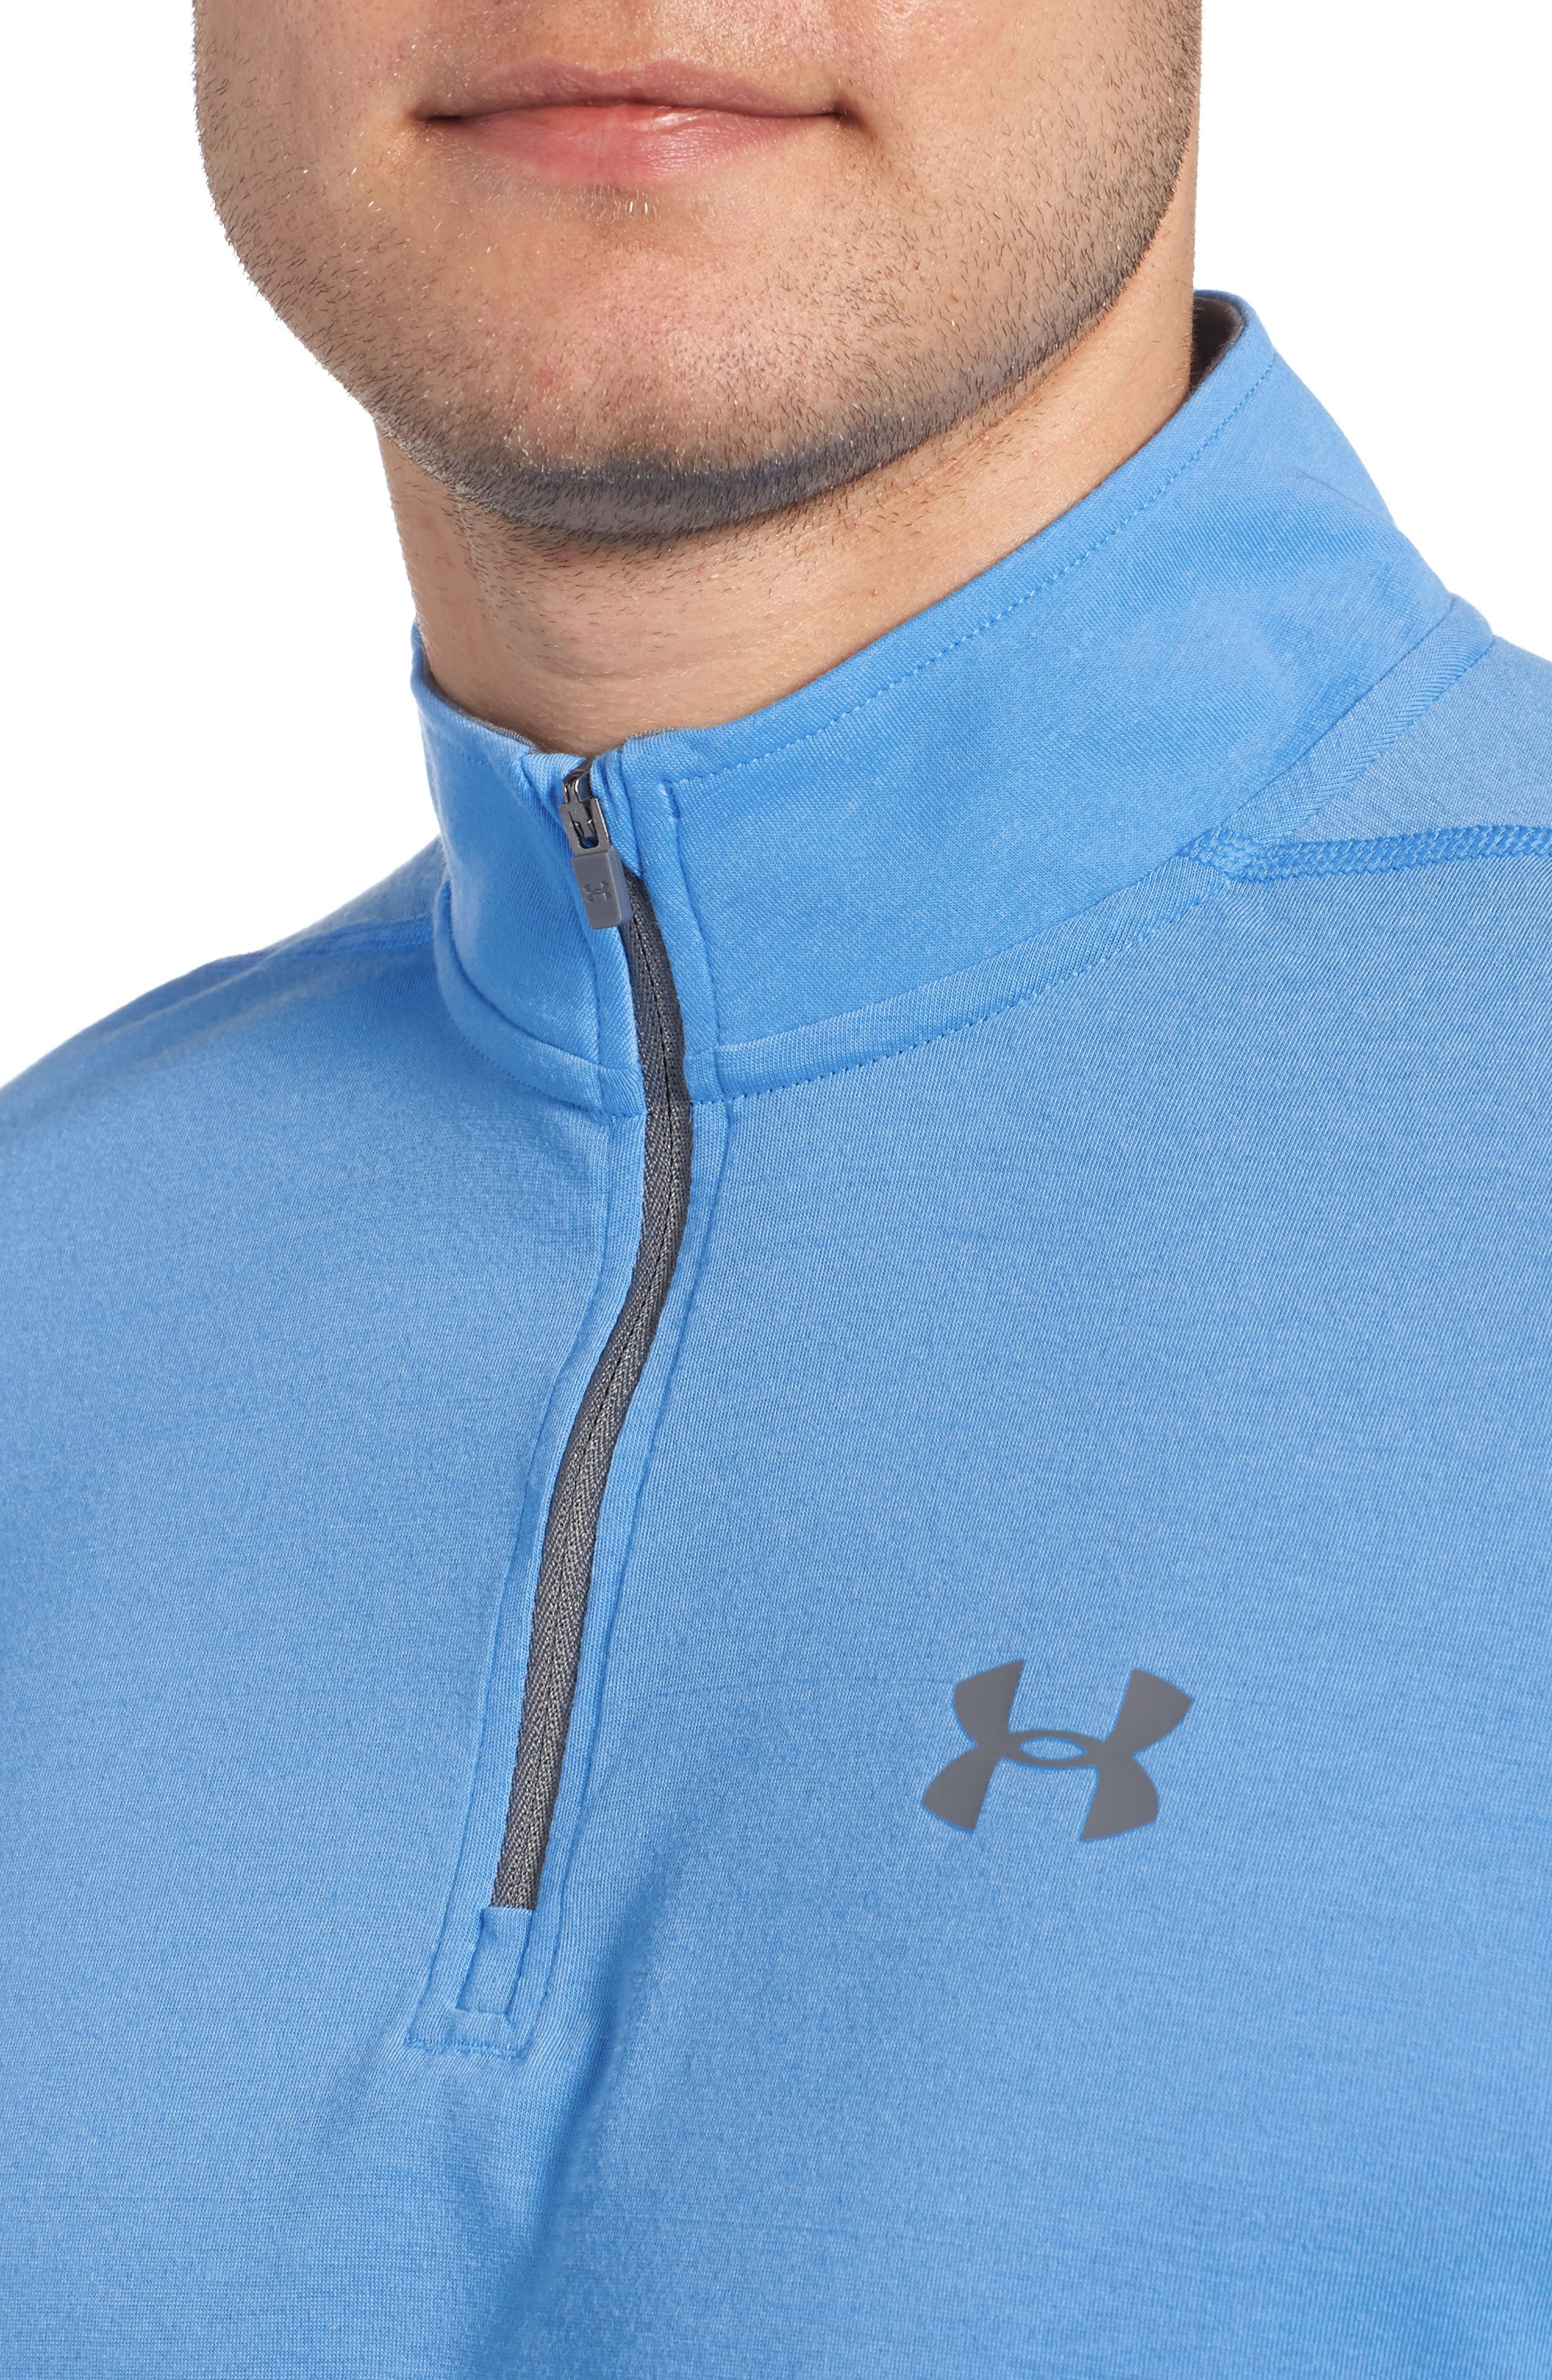 Threadborne Quarter-Zip Performance Shirt,                             Alternate thumbnail 4, color,                             Mako Blue / Graphite